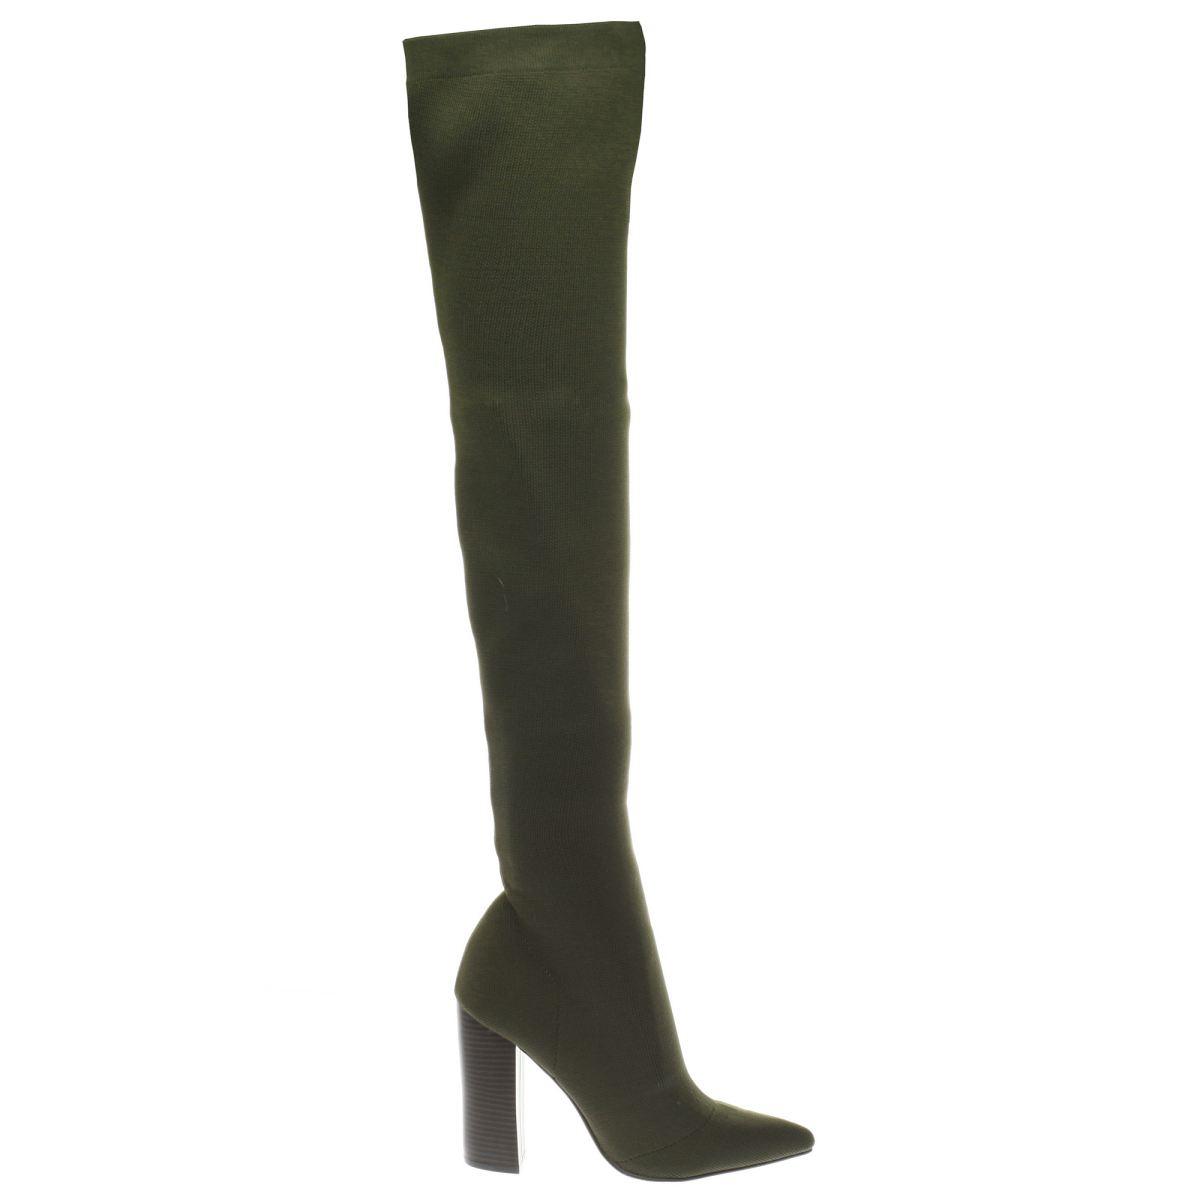 schuh khaki flex boots